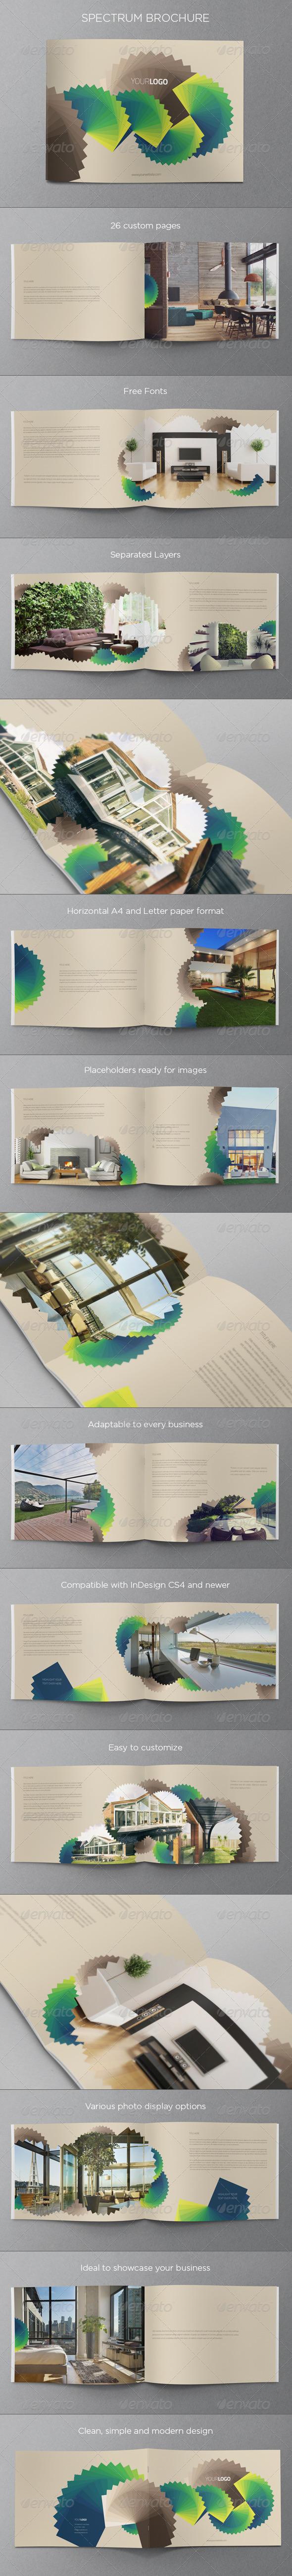 GraphicRiver Spectrum Brochure 5587708